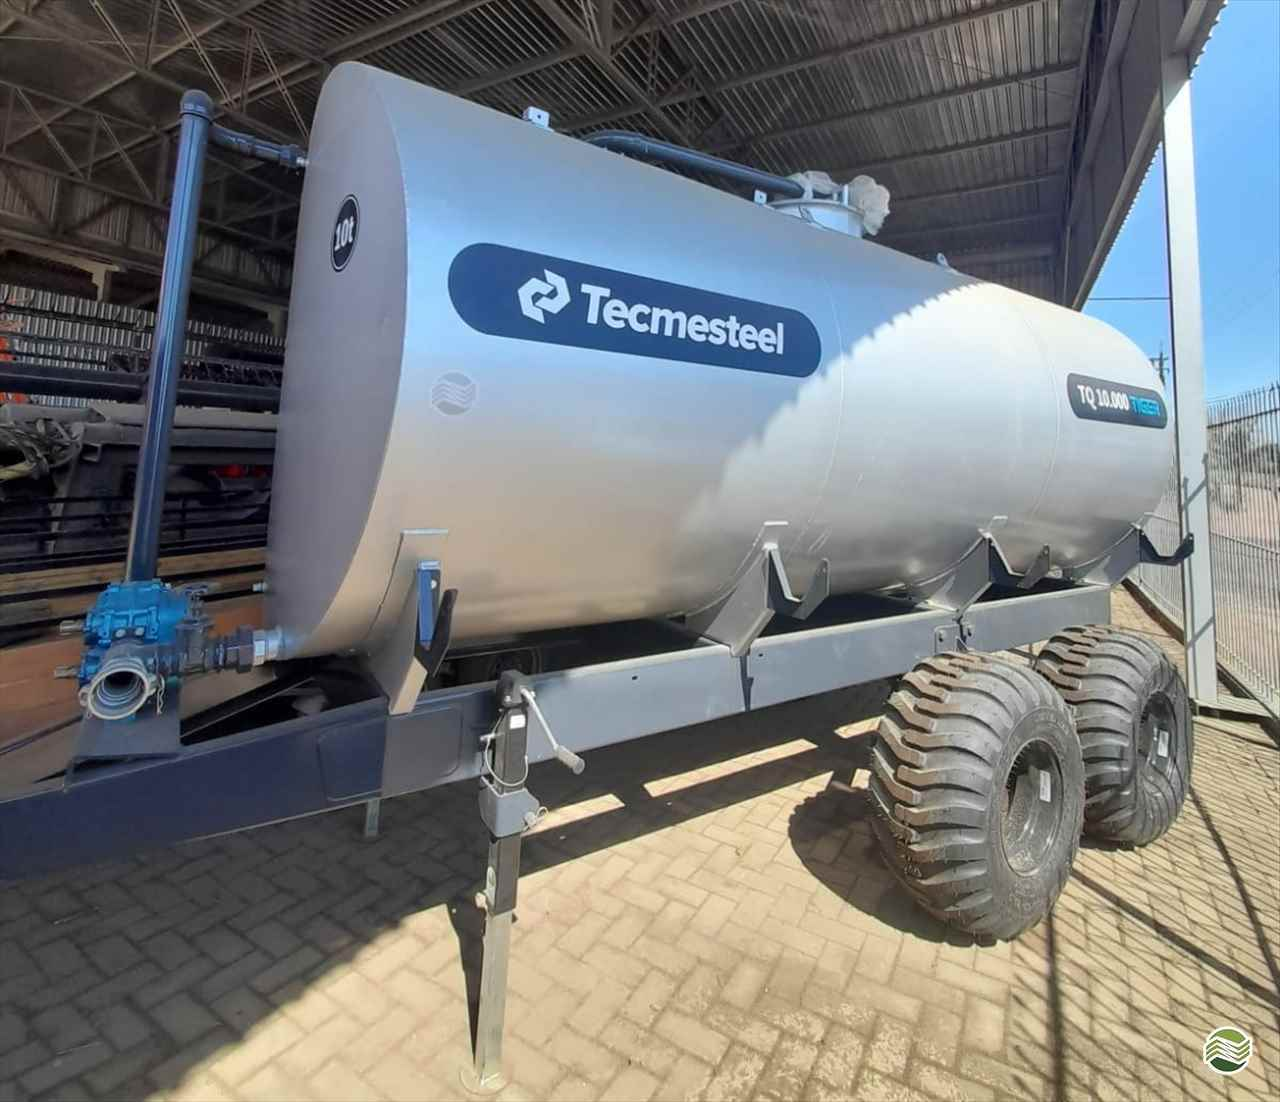 IMPLEMENTOS AGRICOLAS CARRETA TANQUE TANQUE 10000 LITROS Rural Vendas TERRA ROXA PARANÁ PR